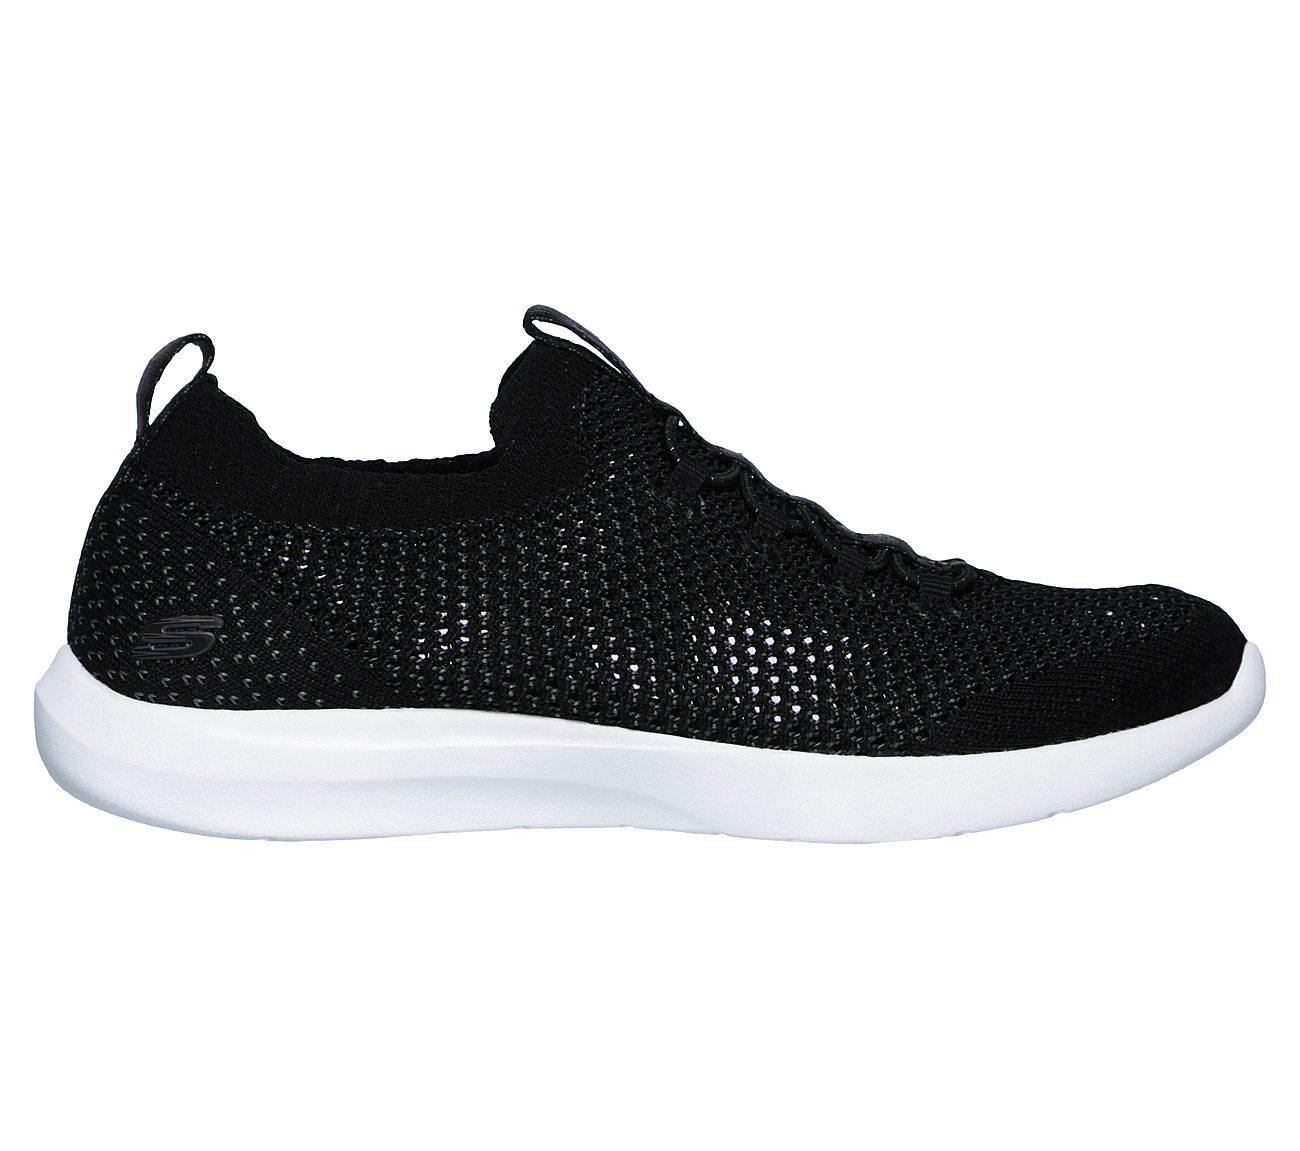 SKECHERS Mujer Calzado Confort ZAPATO SKECHERS SPORT Negro